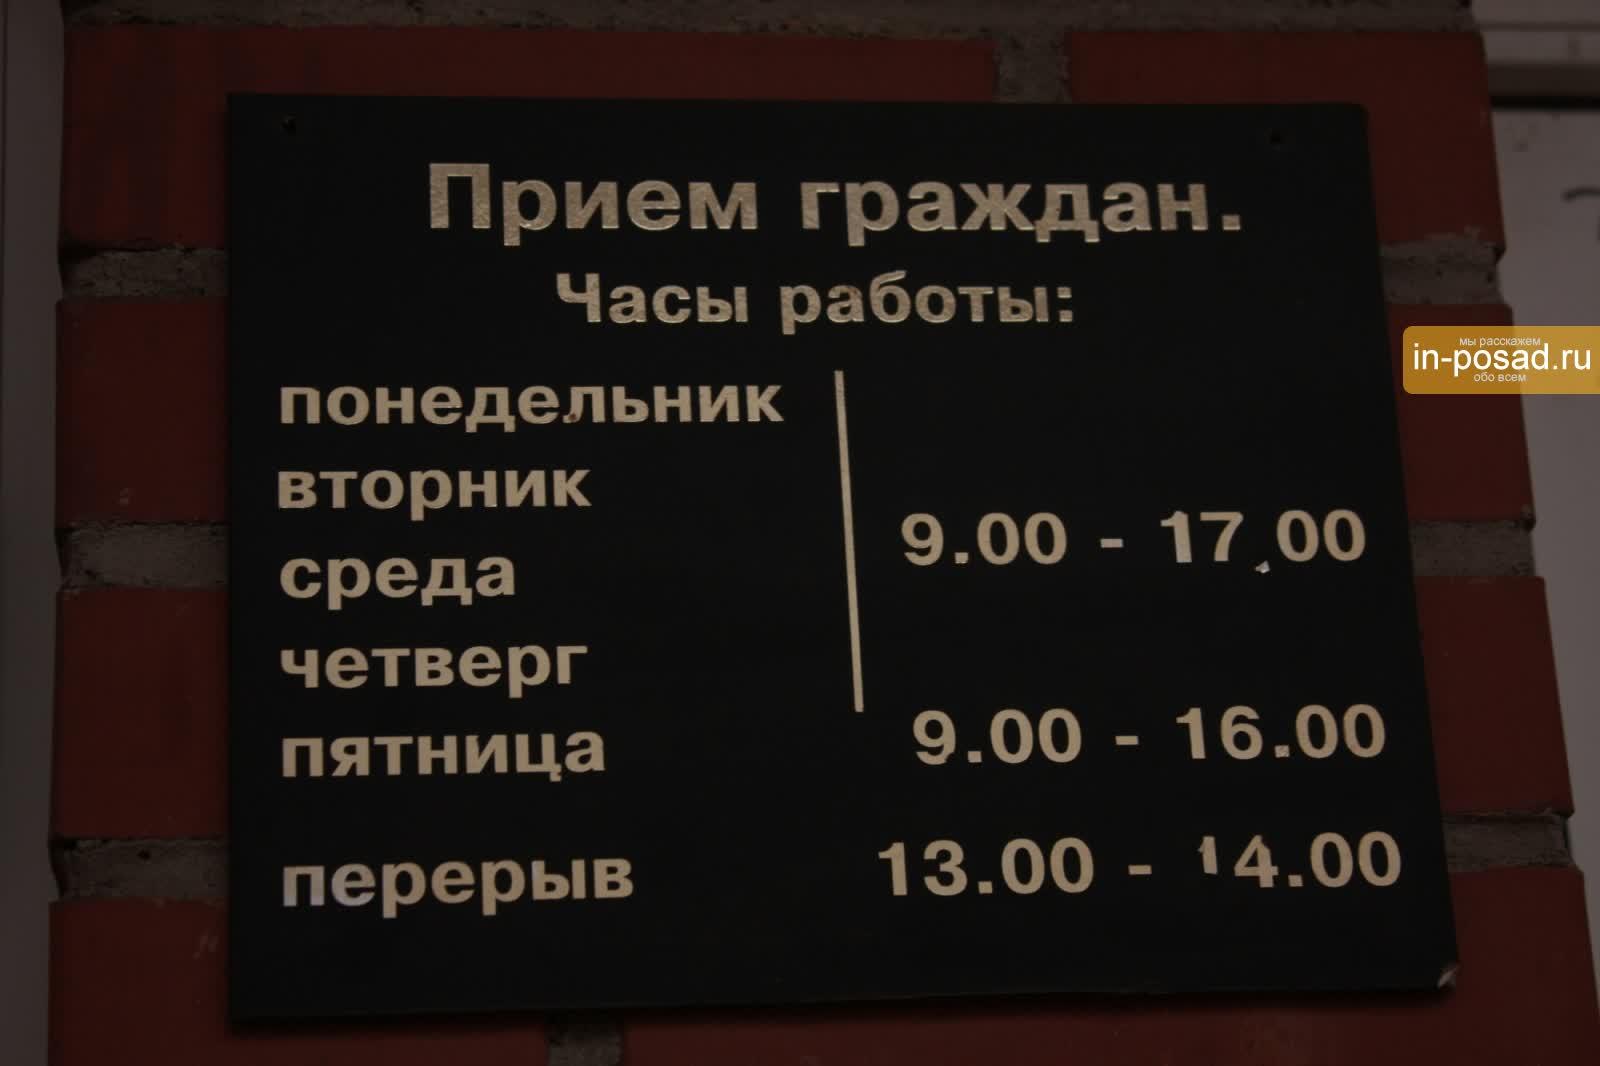 график работы пфр: